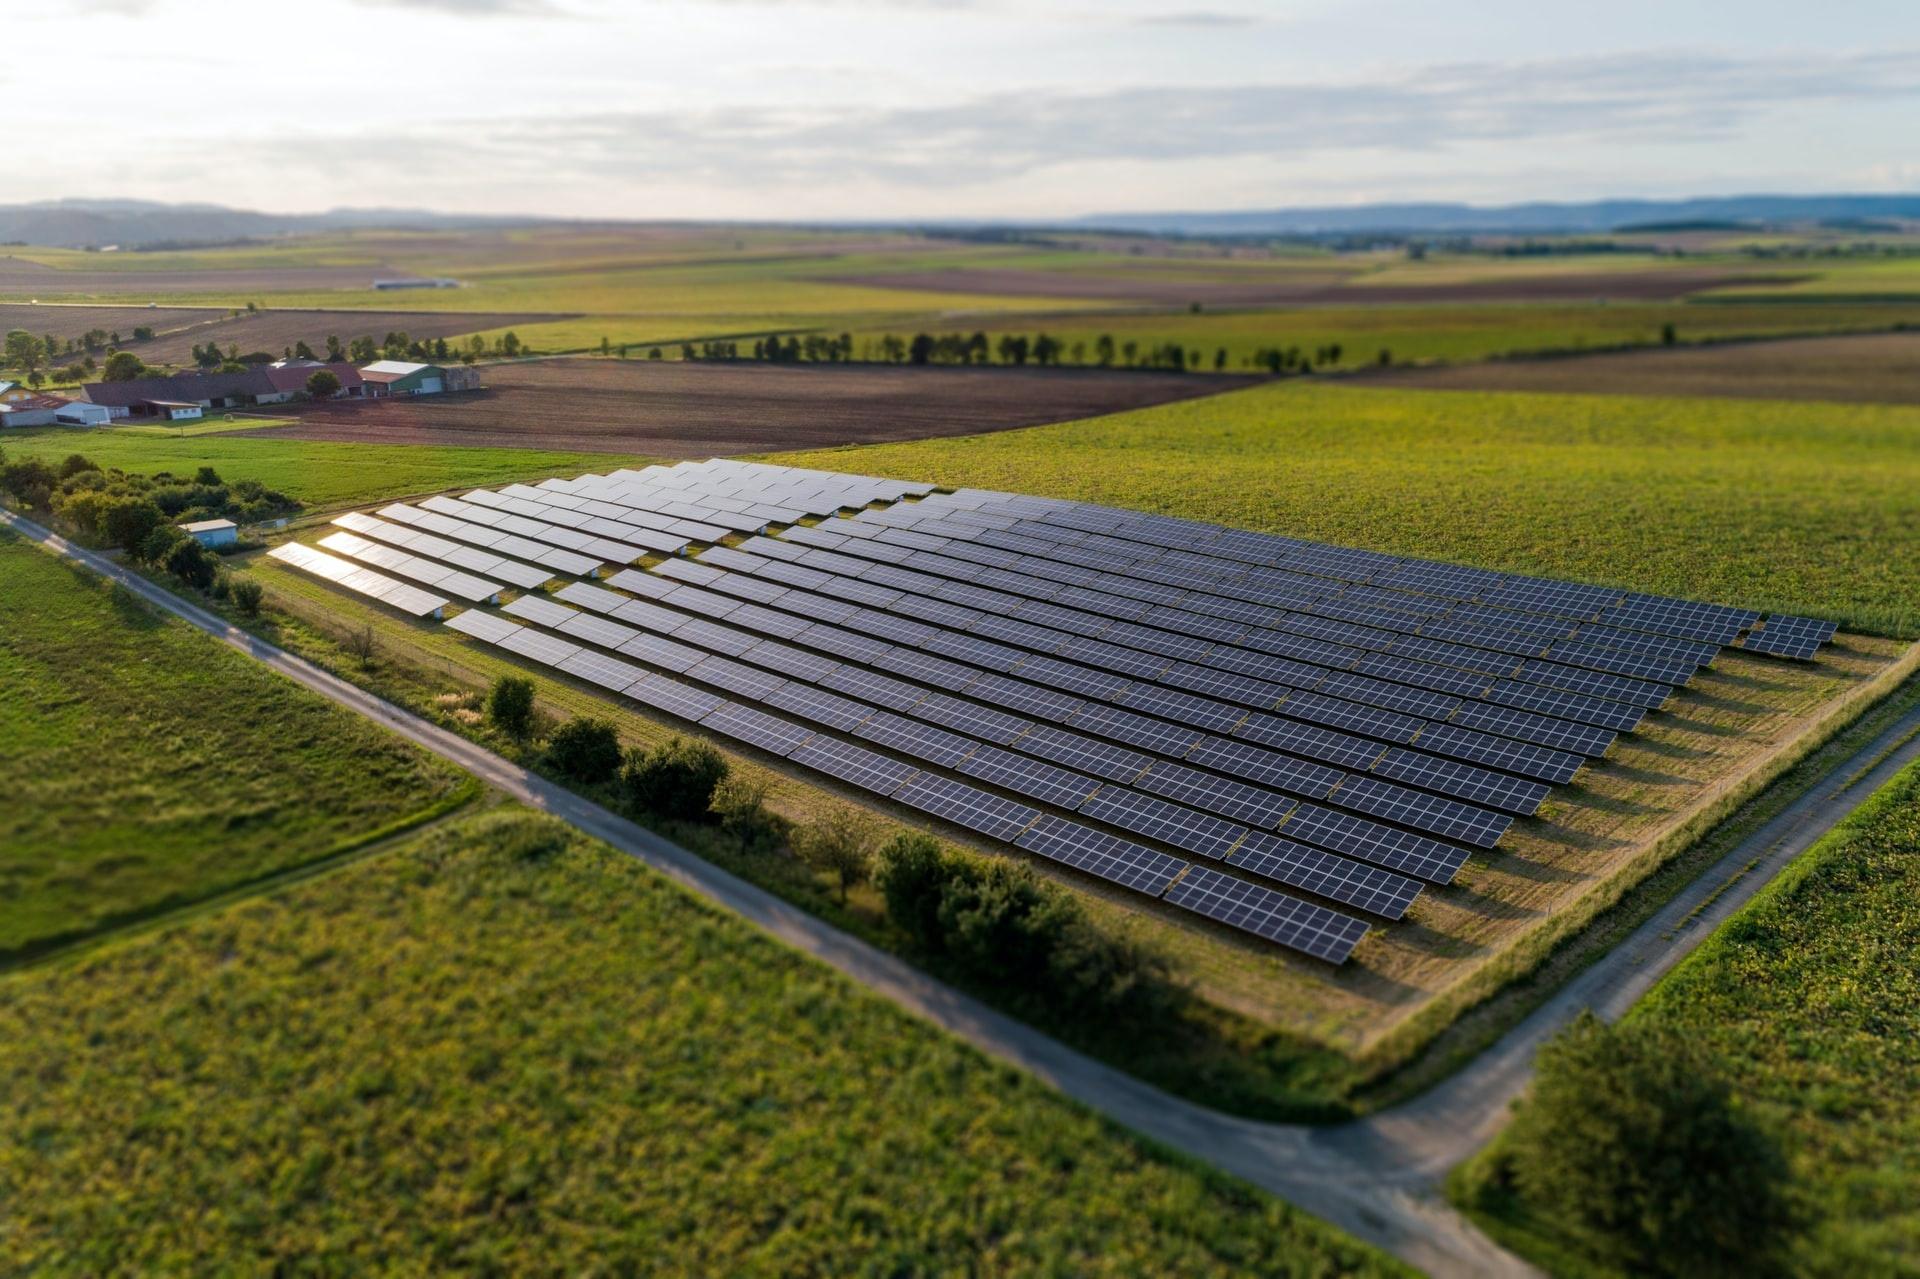 Solar Panel Farm, YSG Solar